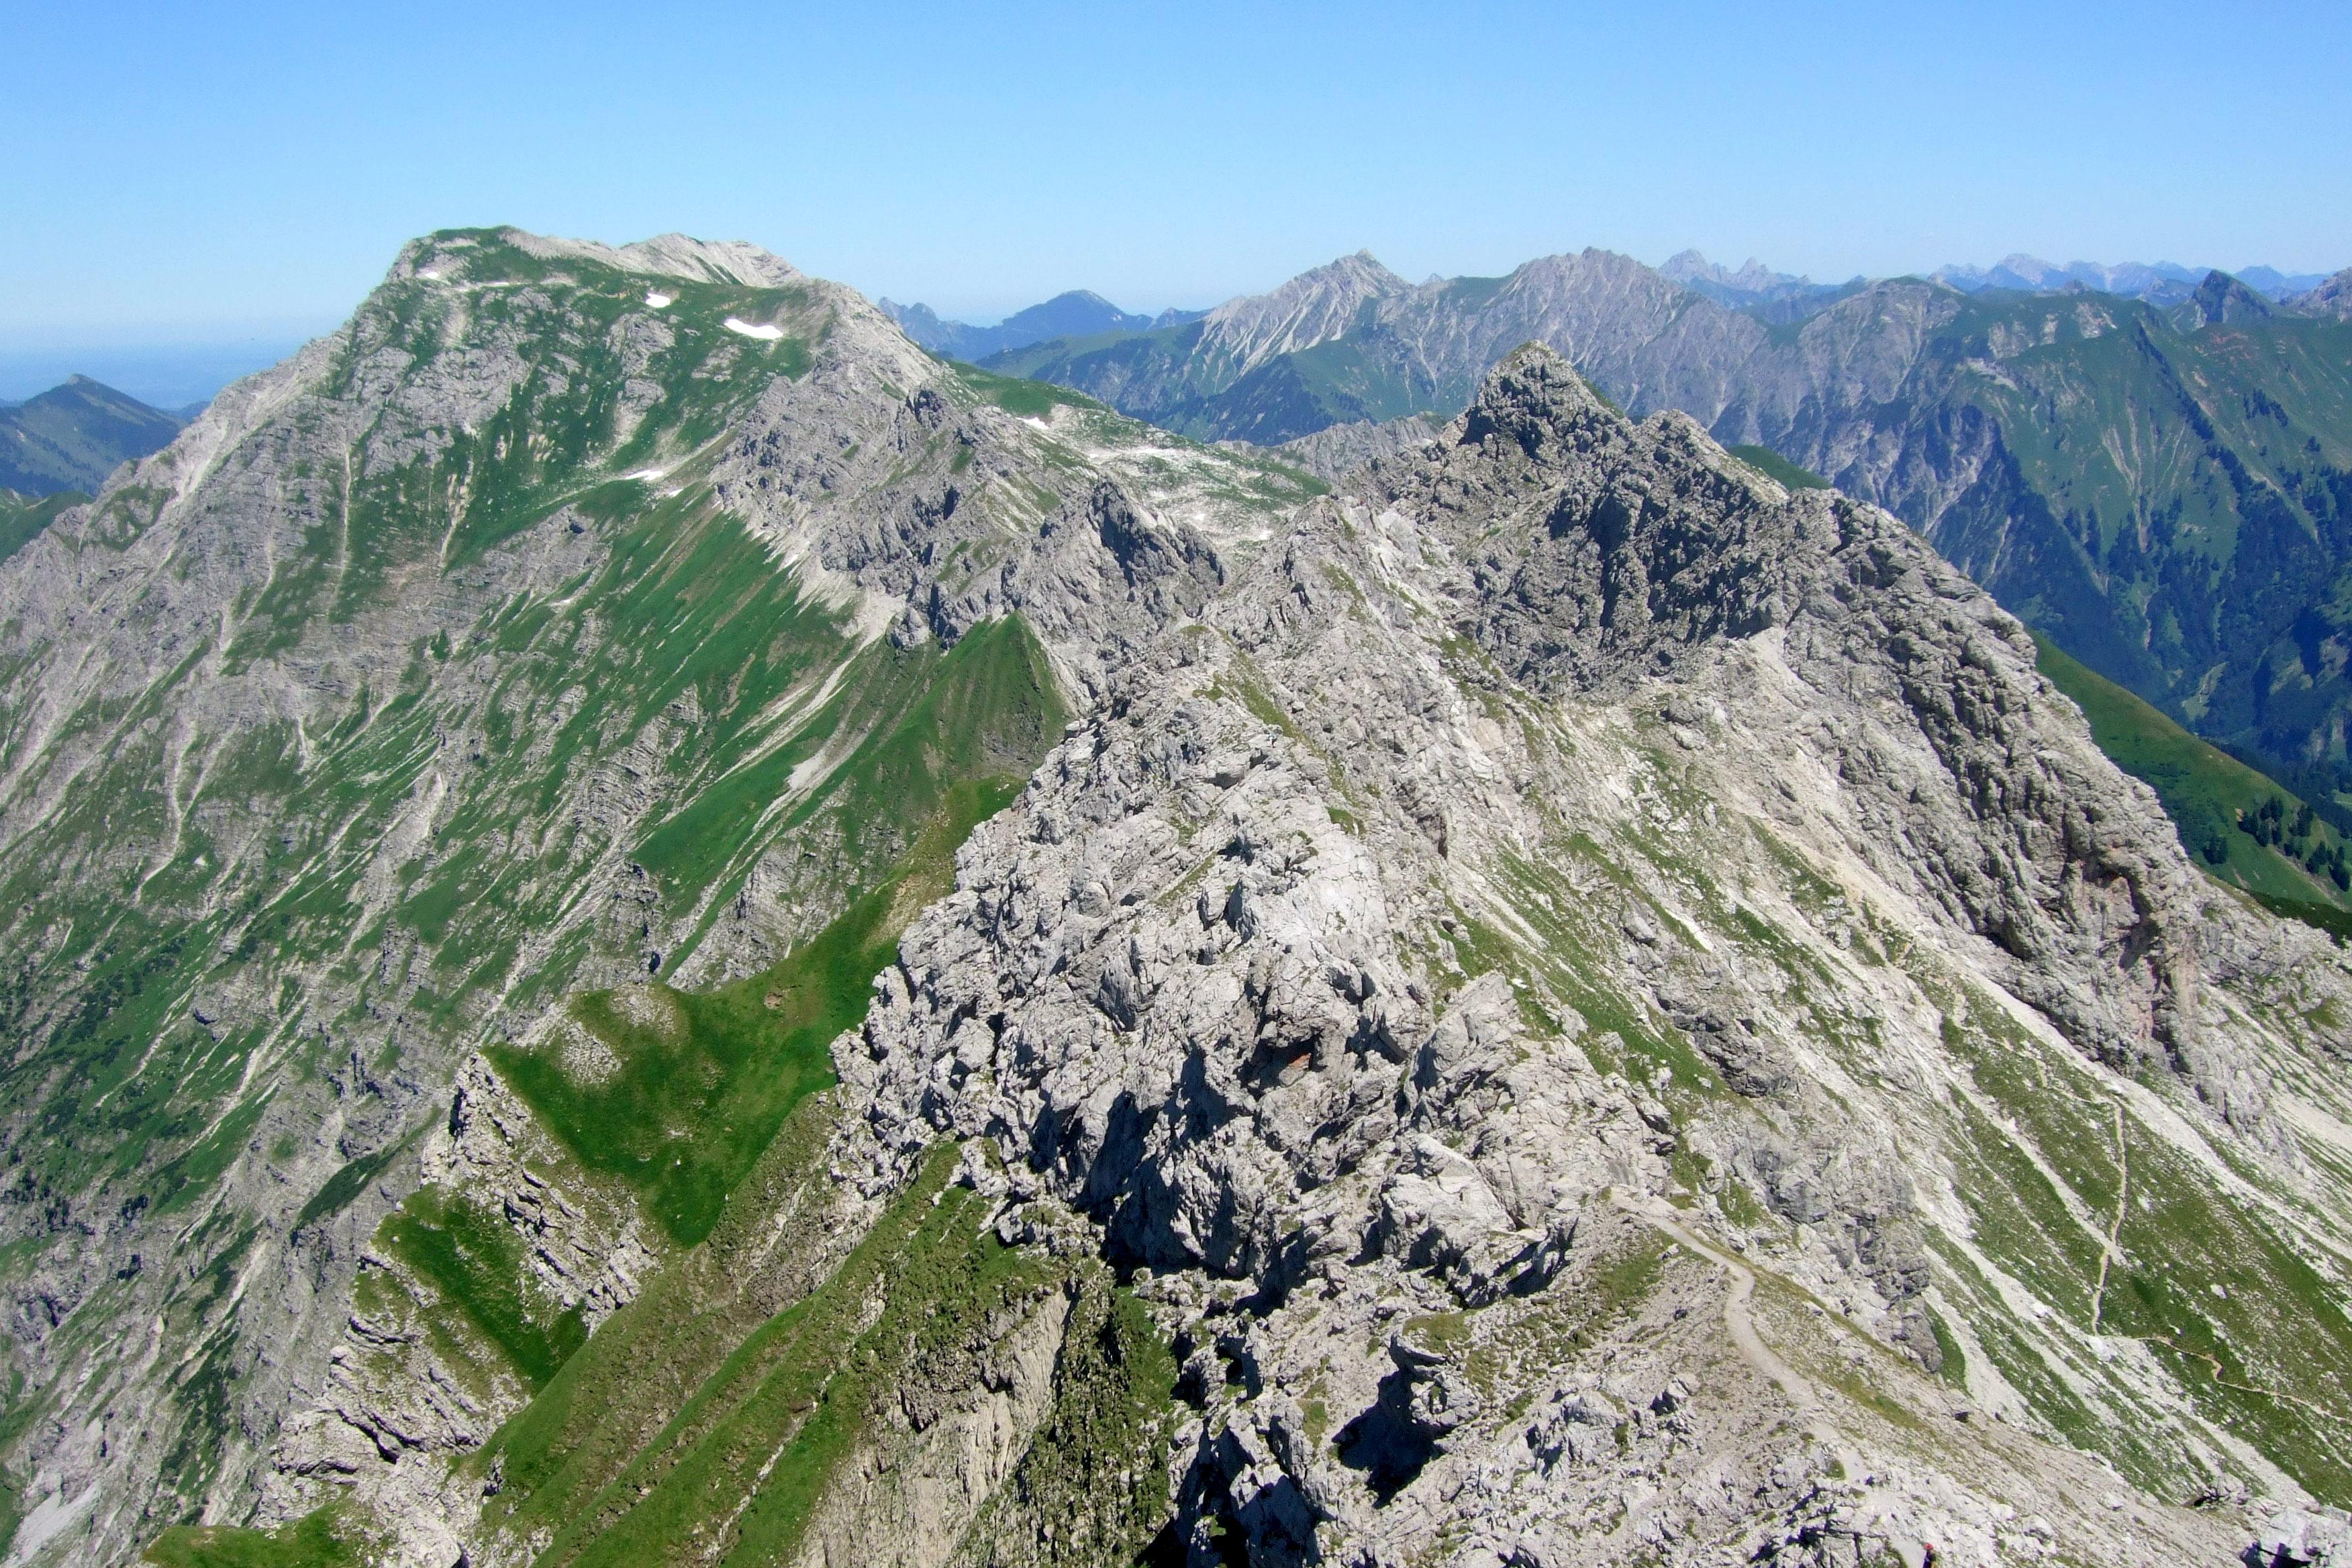 Klettersteig Nebelhorn : Hindelanger klettersteig allgäu lisa unterwegs